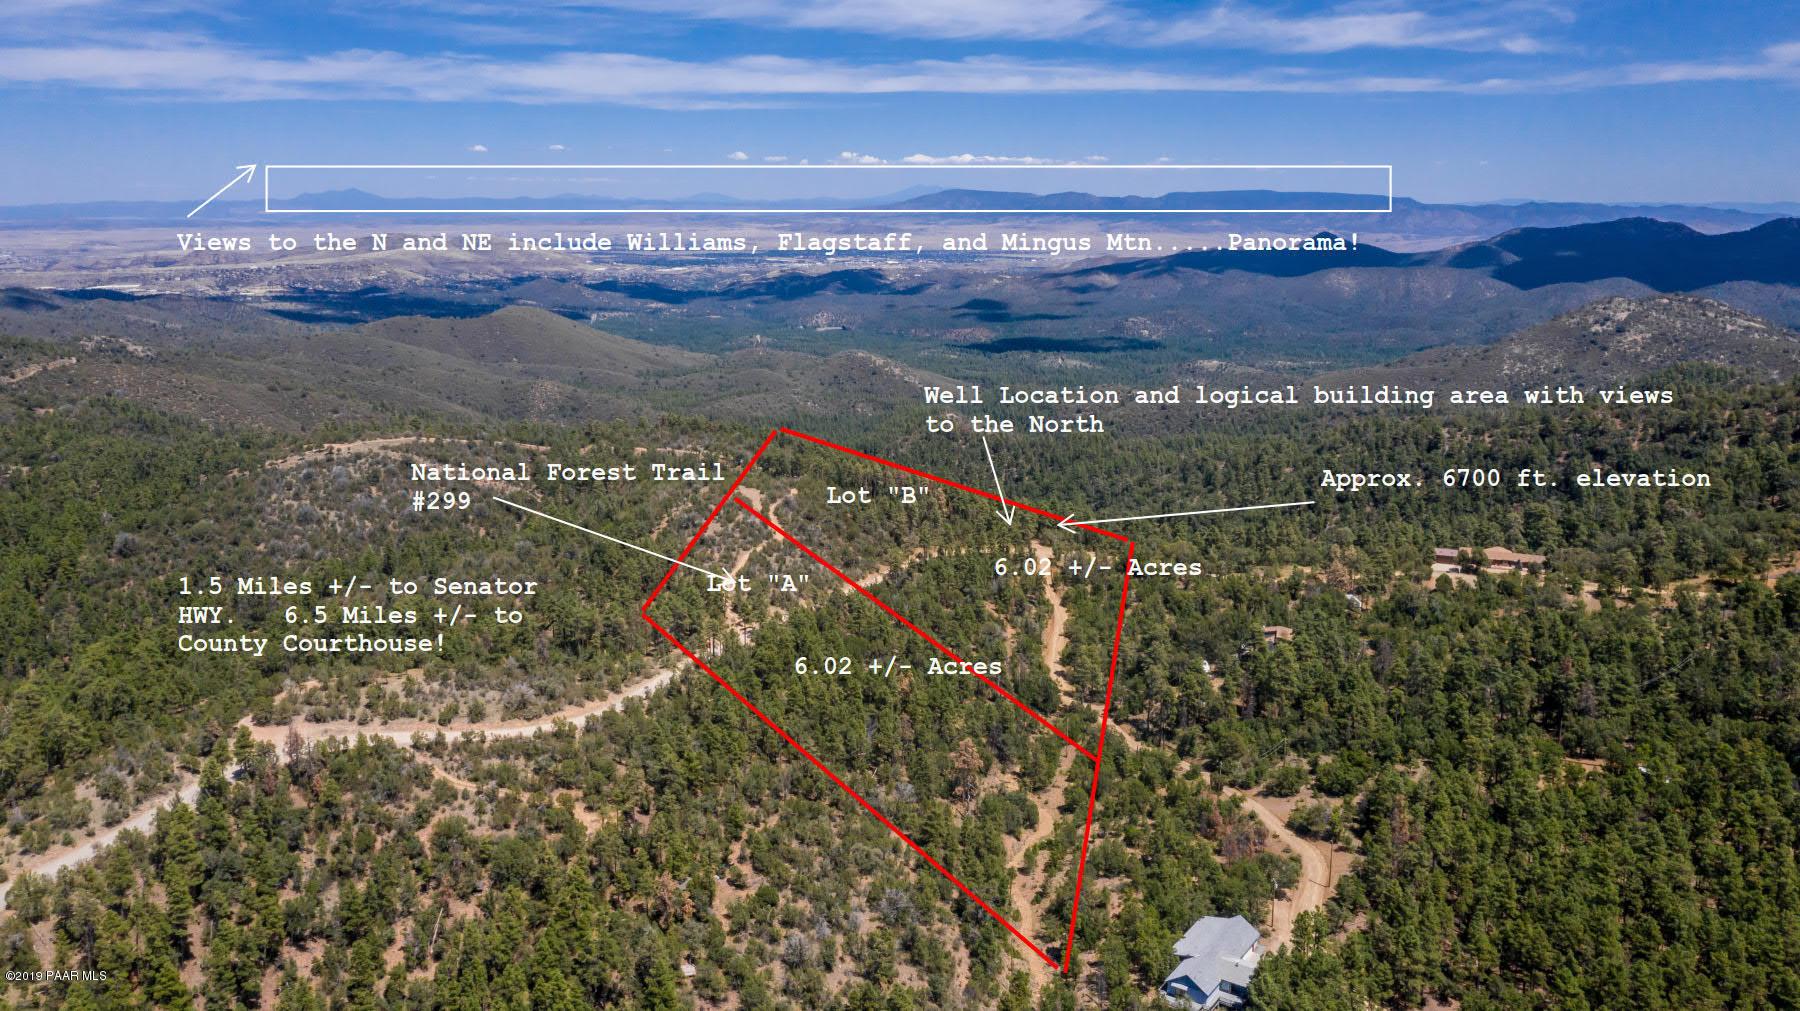 Photo of Spruce Mountain Lot B, Prescott, AZ 86303